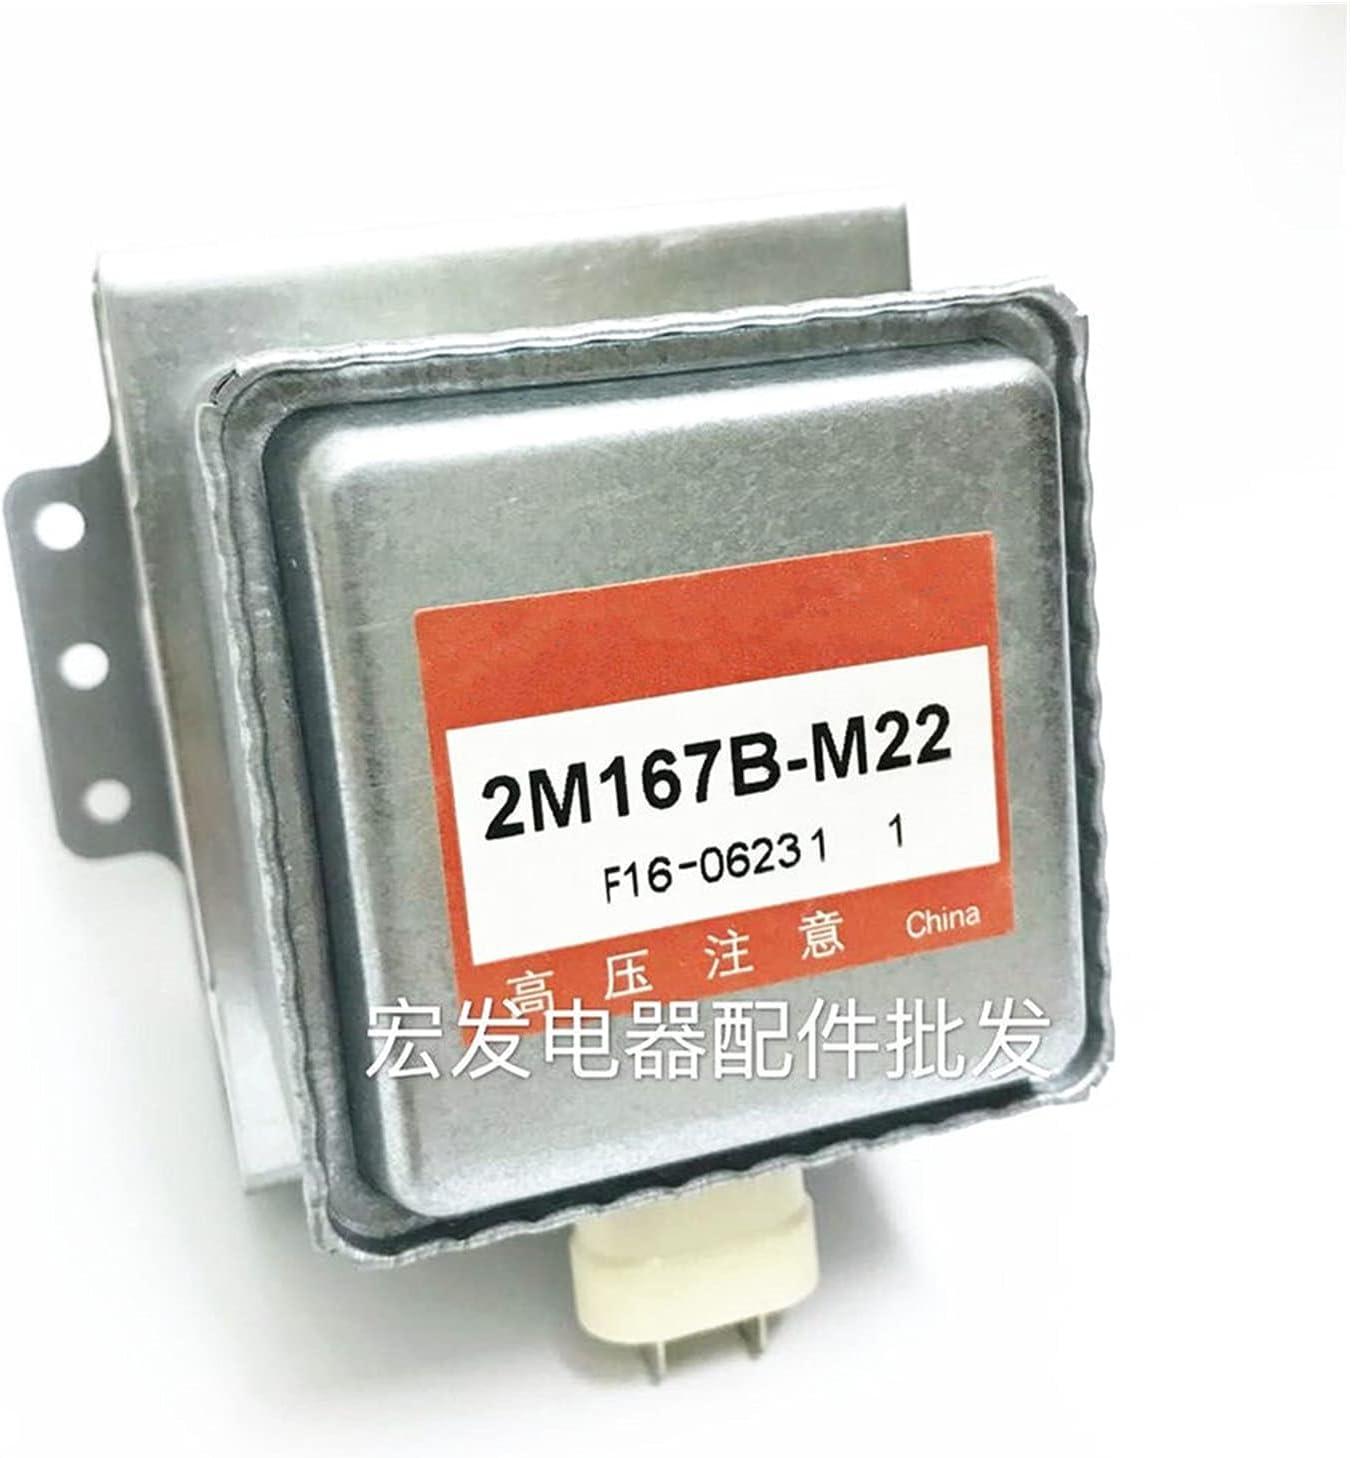 ZCX Zcxiong 100% Nuevo para P/anasonic Industrial Microwave Horno Partes 2M167B-M22 Magnetron Microondas Magretron Accesorios Magnetron Parte